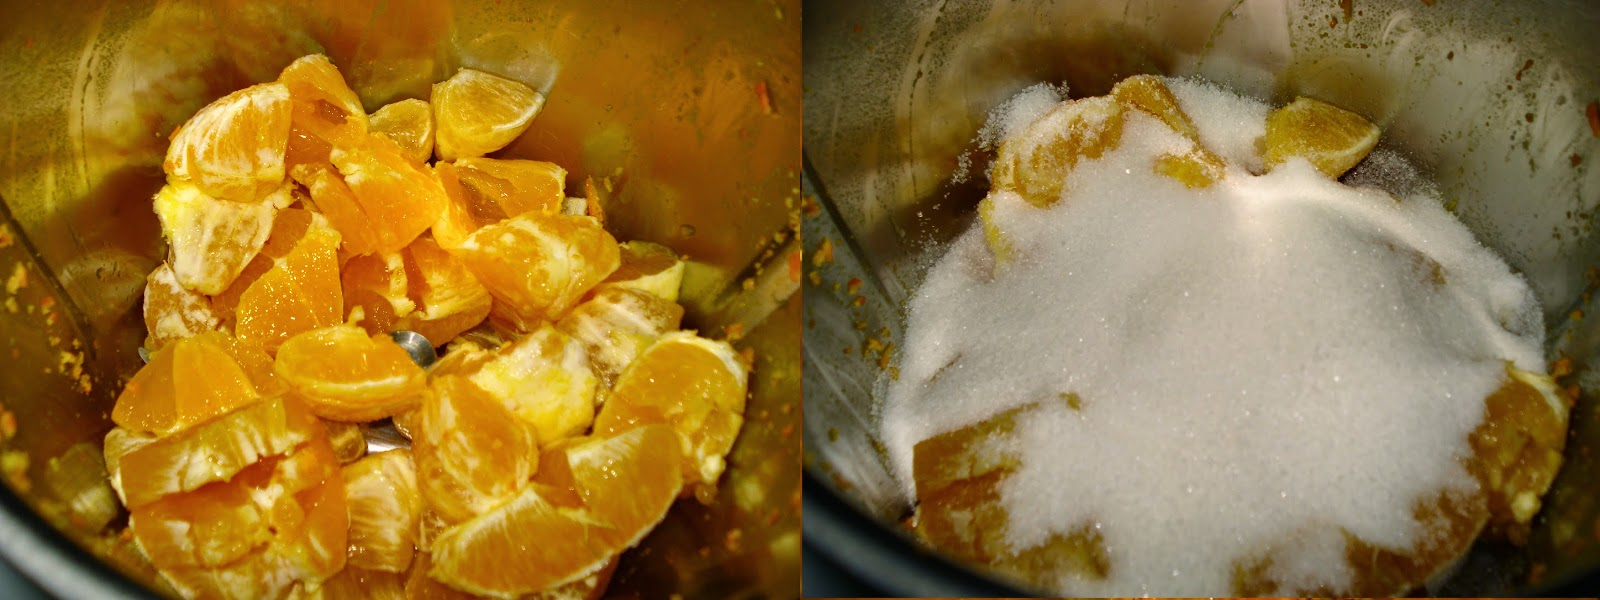 Mermelada De Naranja (thermomix)